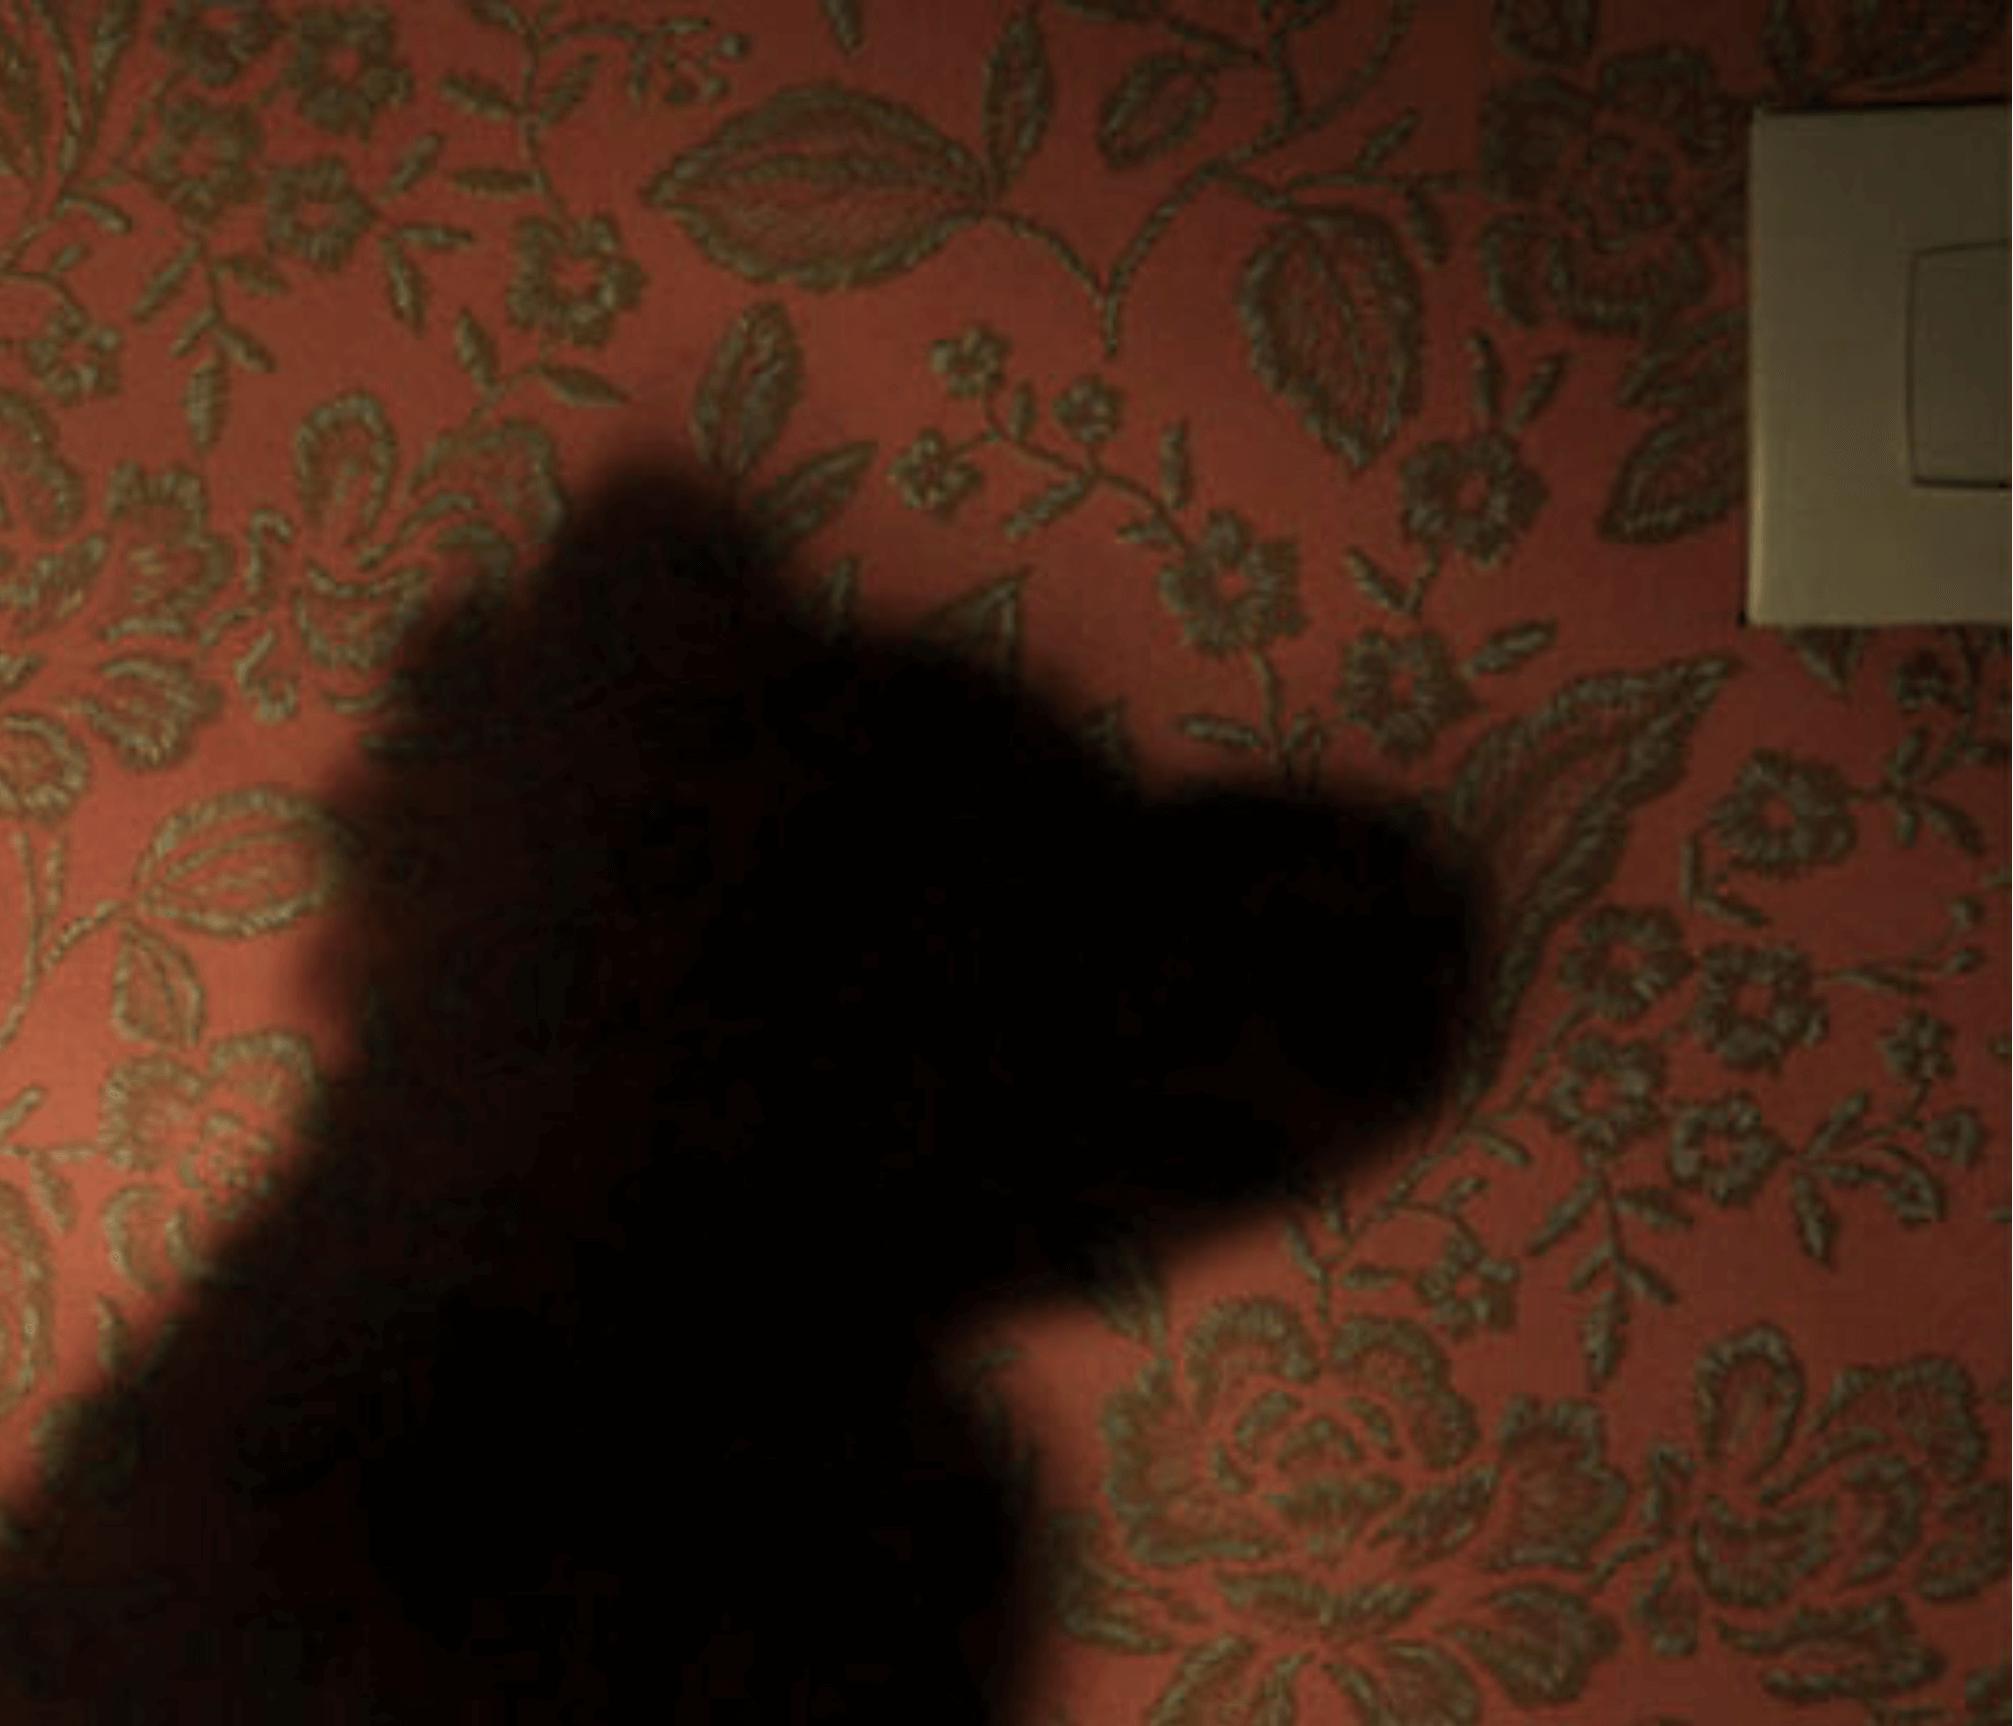 Teddy bear night shadow on a bedroomwall